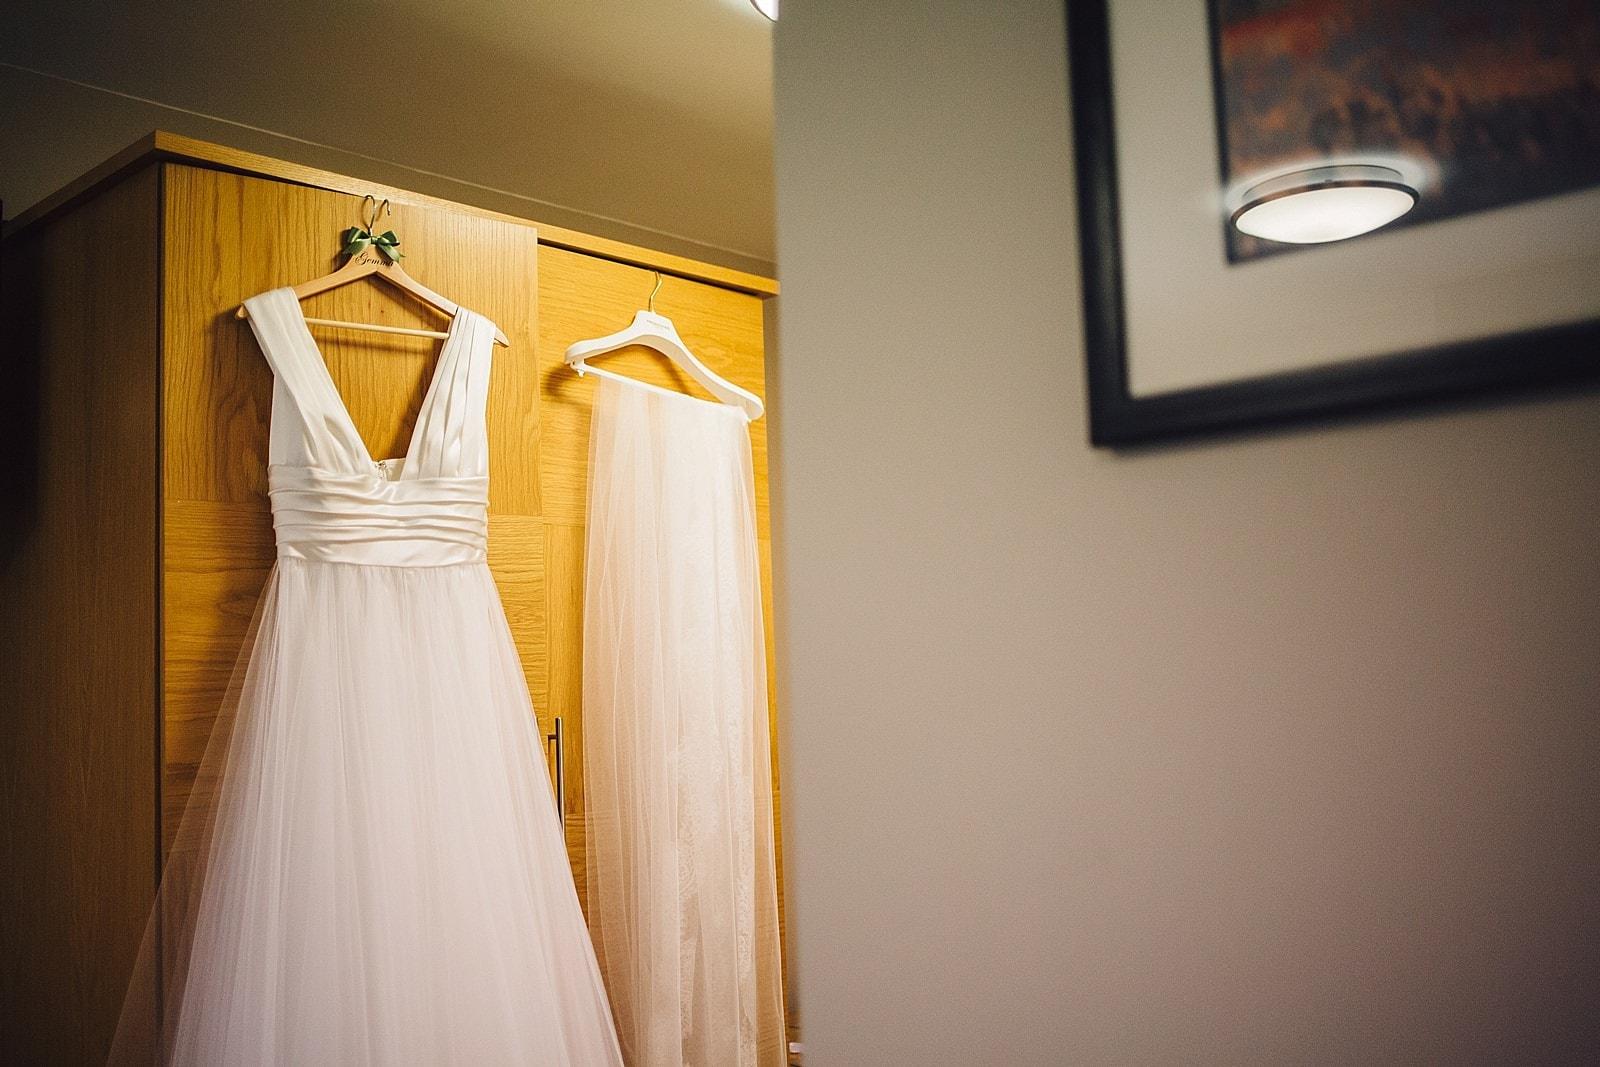 hothorpe-hall-woodlands-wedding-photography_0003